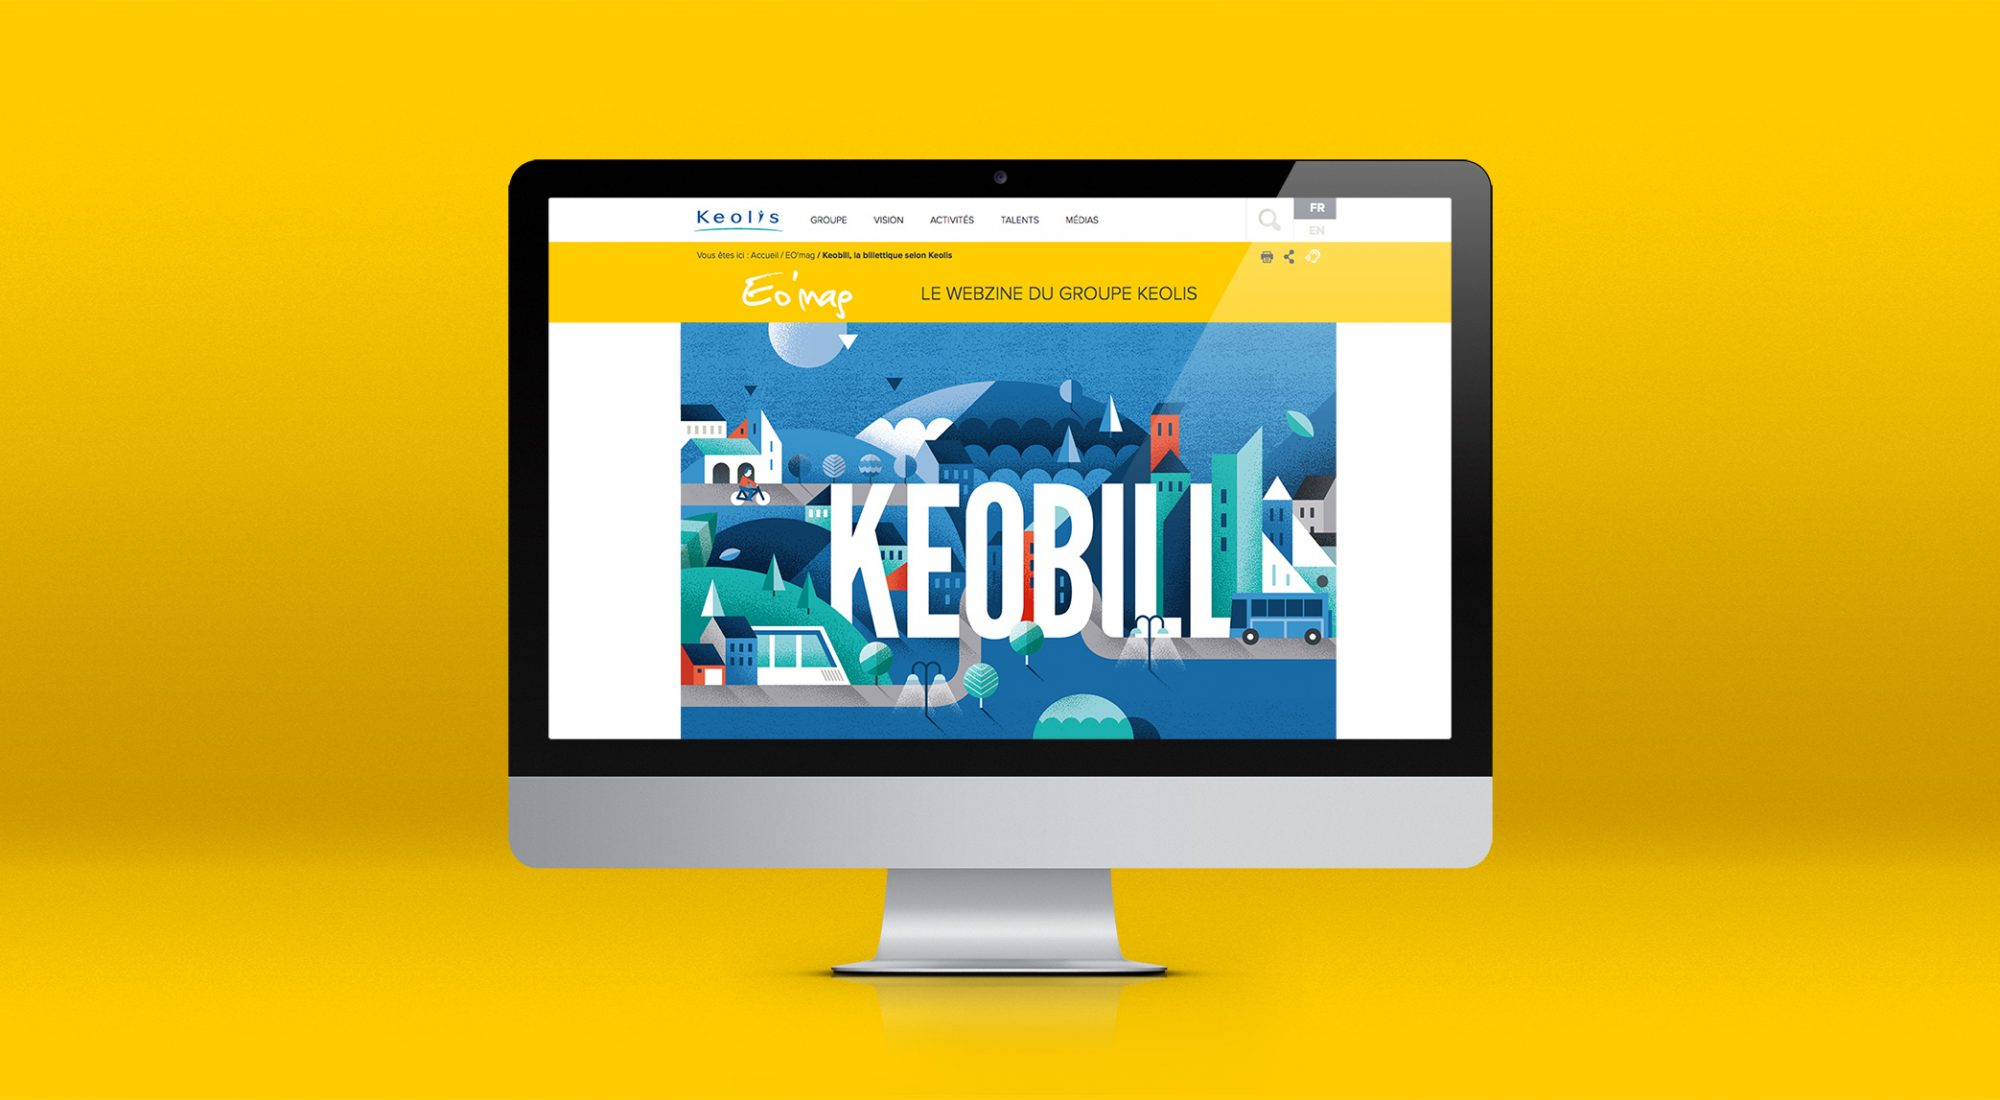 KEOBILL_simu5